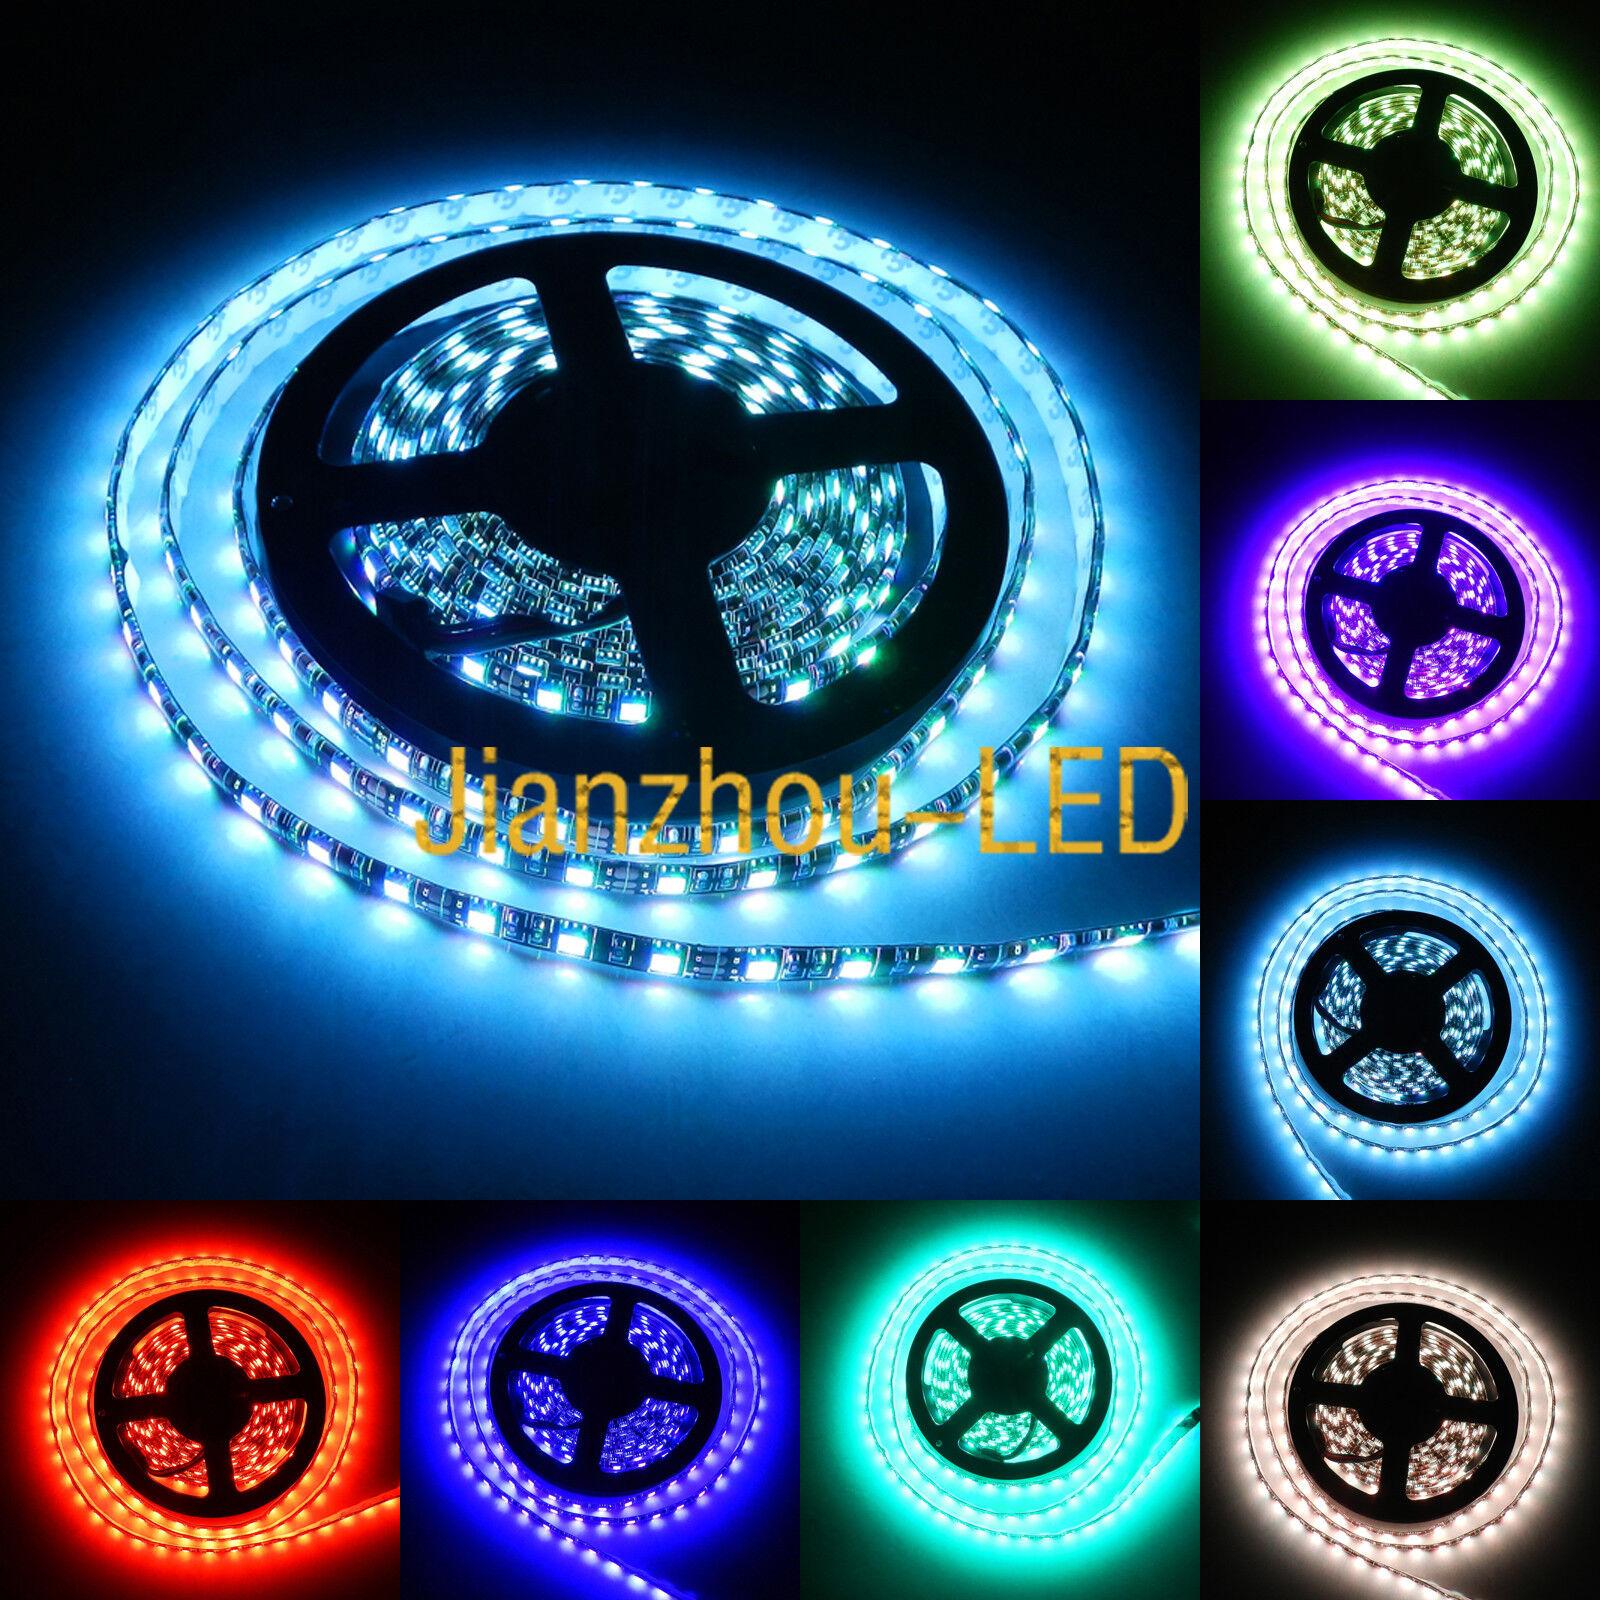 $T2eC16RHJH8E9qSEVnvVBRQy66u3yg~~60_57 Fabelhafte Led Flex Lichtleisten Set Dekorationen